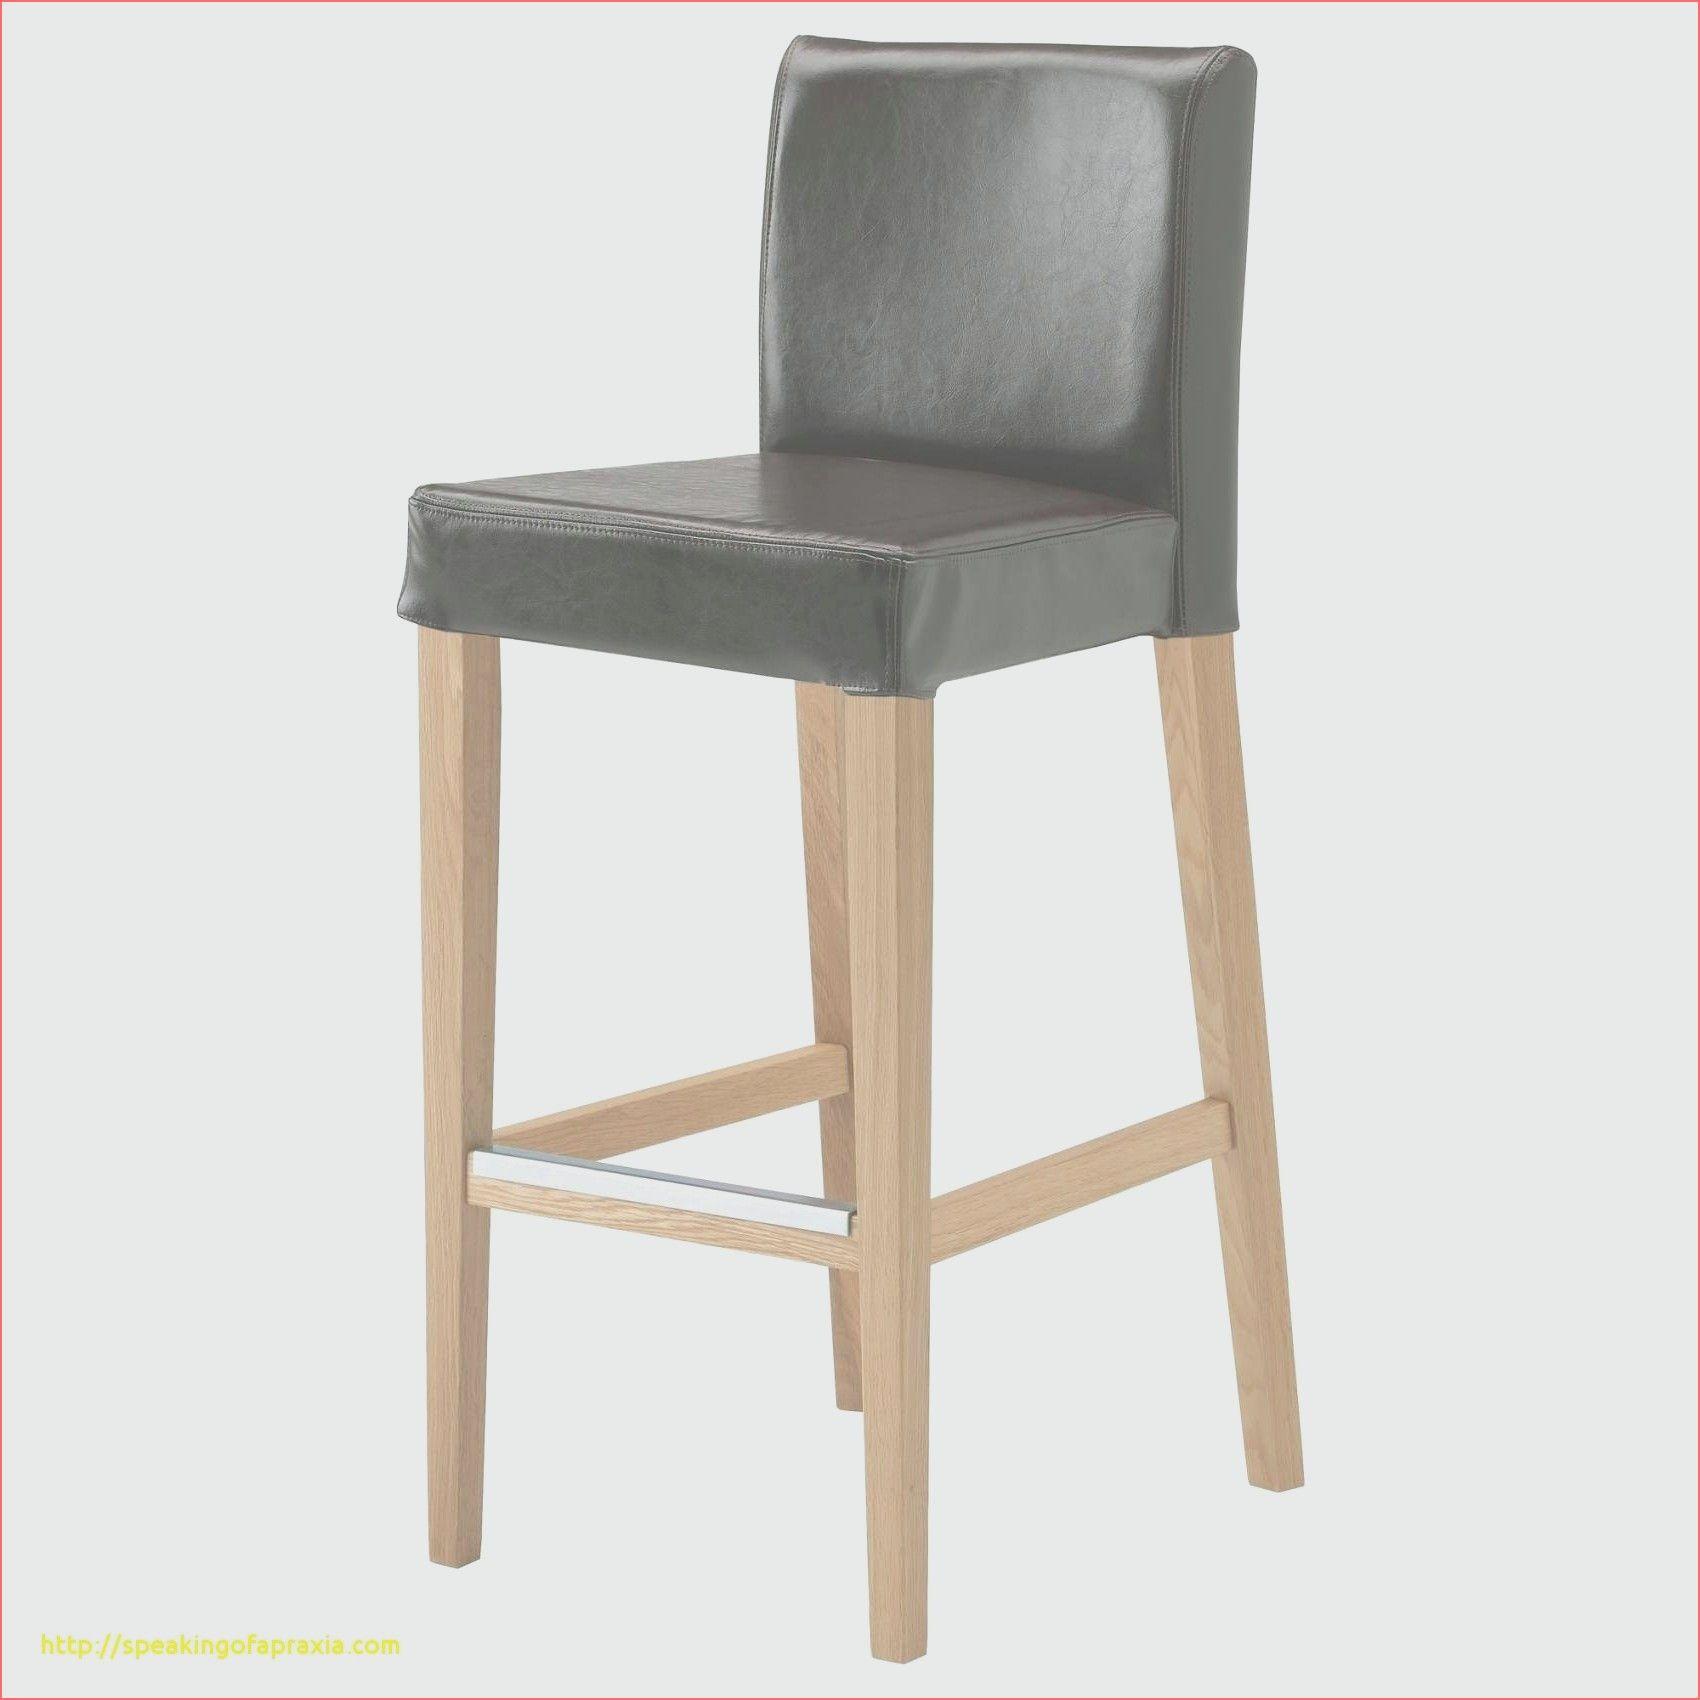 10 Pas Cher Chaise Bar Alinea In 2020 Industrial Bar Stools Buy Modern Furniture Bar Interior Design